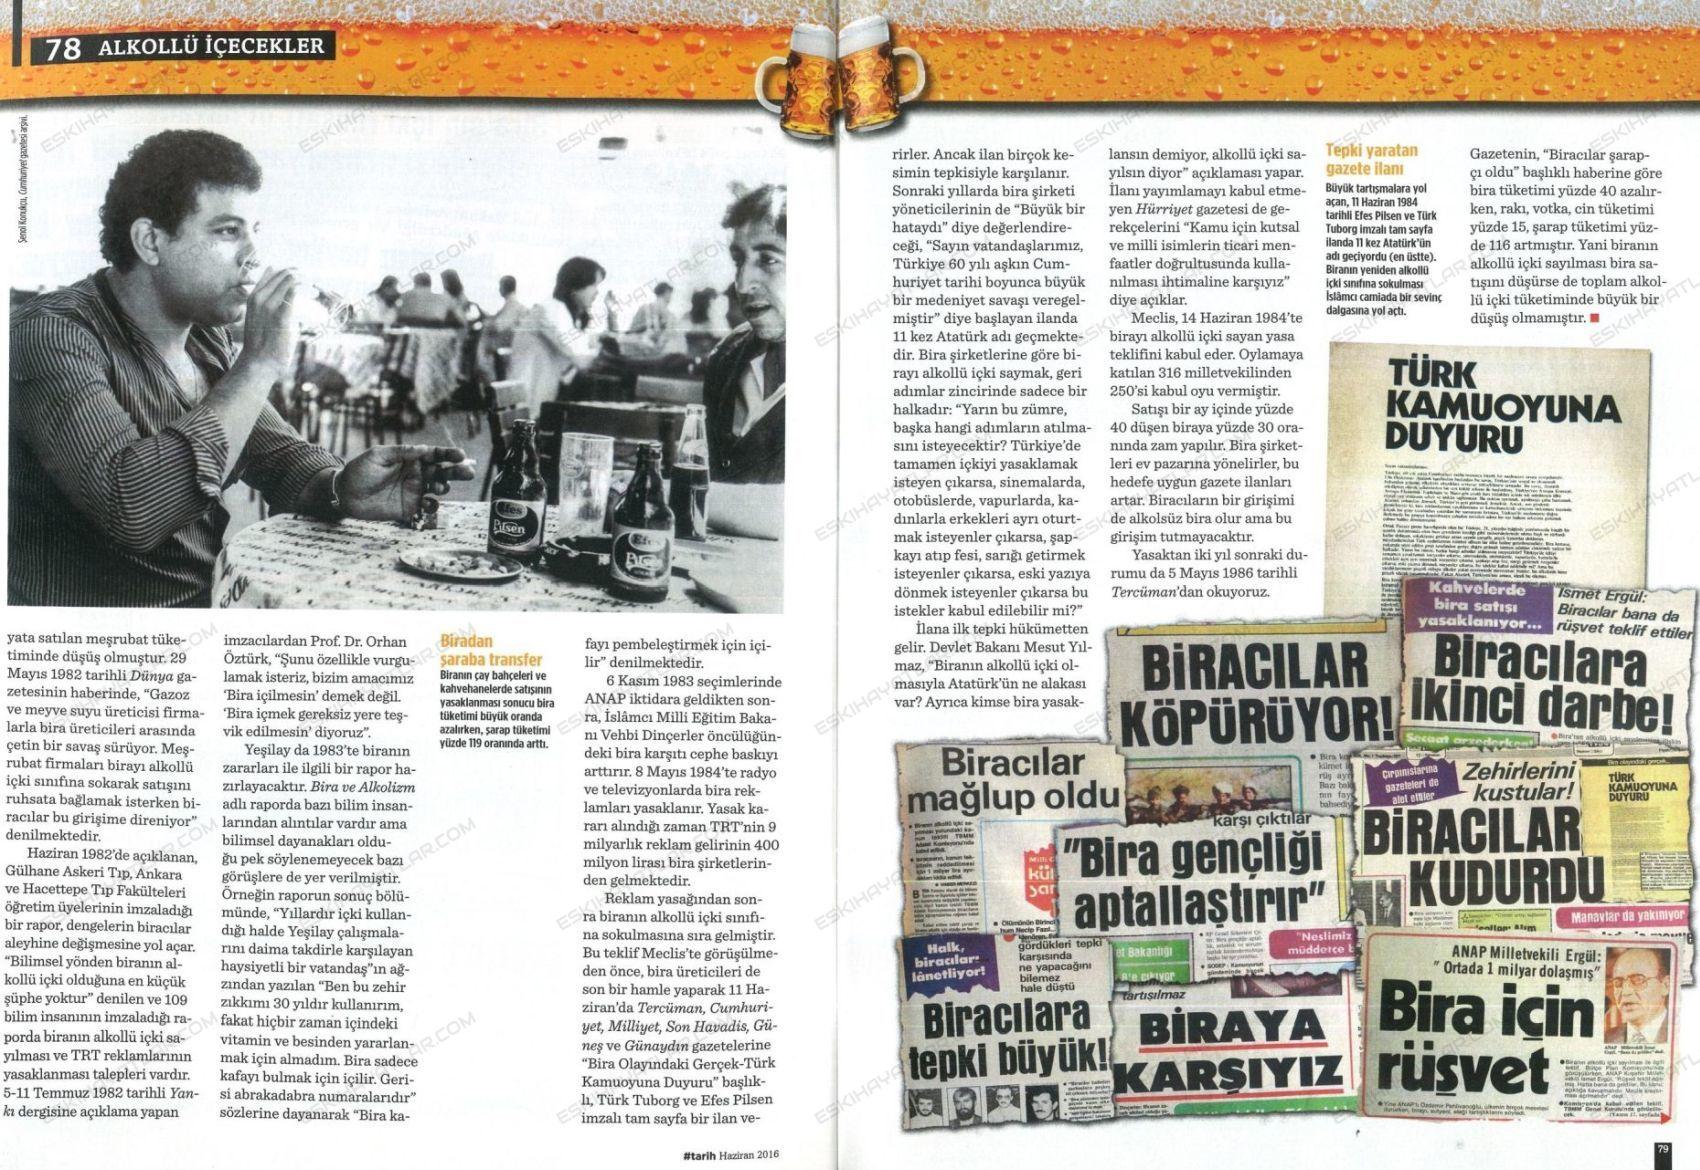 0777-biranin-kopurttugu-buyuk-kavga-1969-turk-tuborg-fabrika-kurulusu-1969-efes-pilsen-fabrika-kurulusu-bira-haberleri (1)